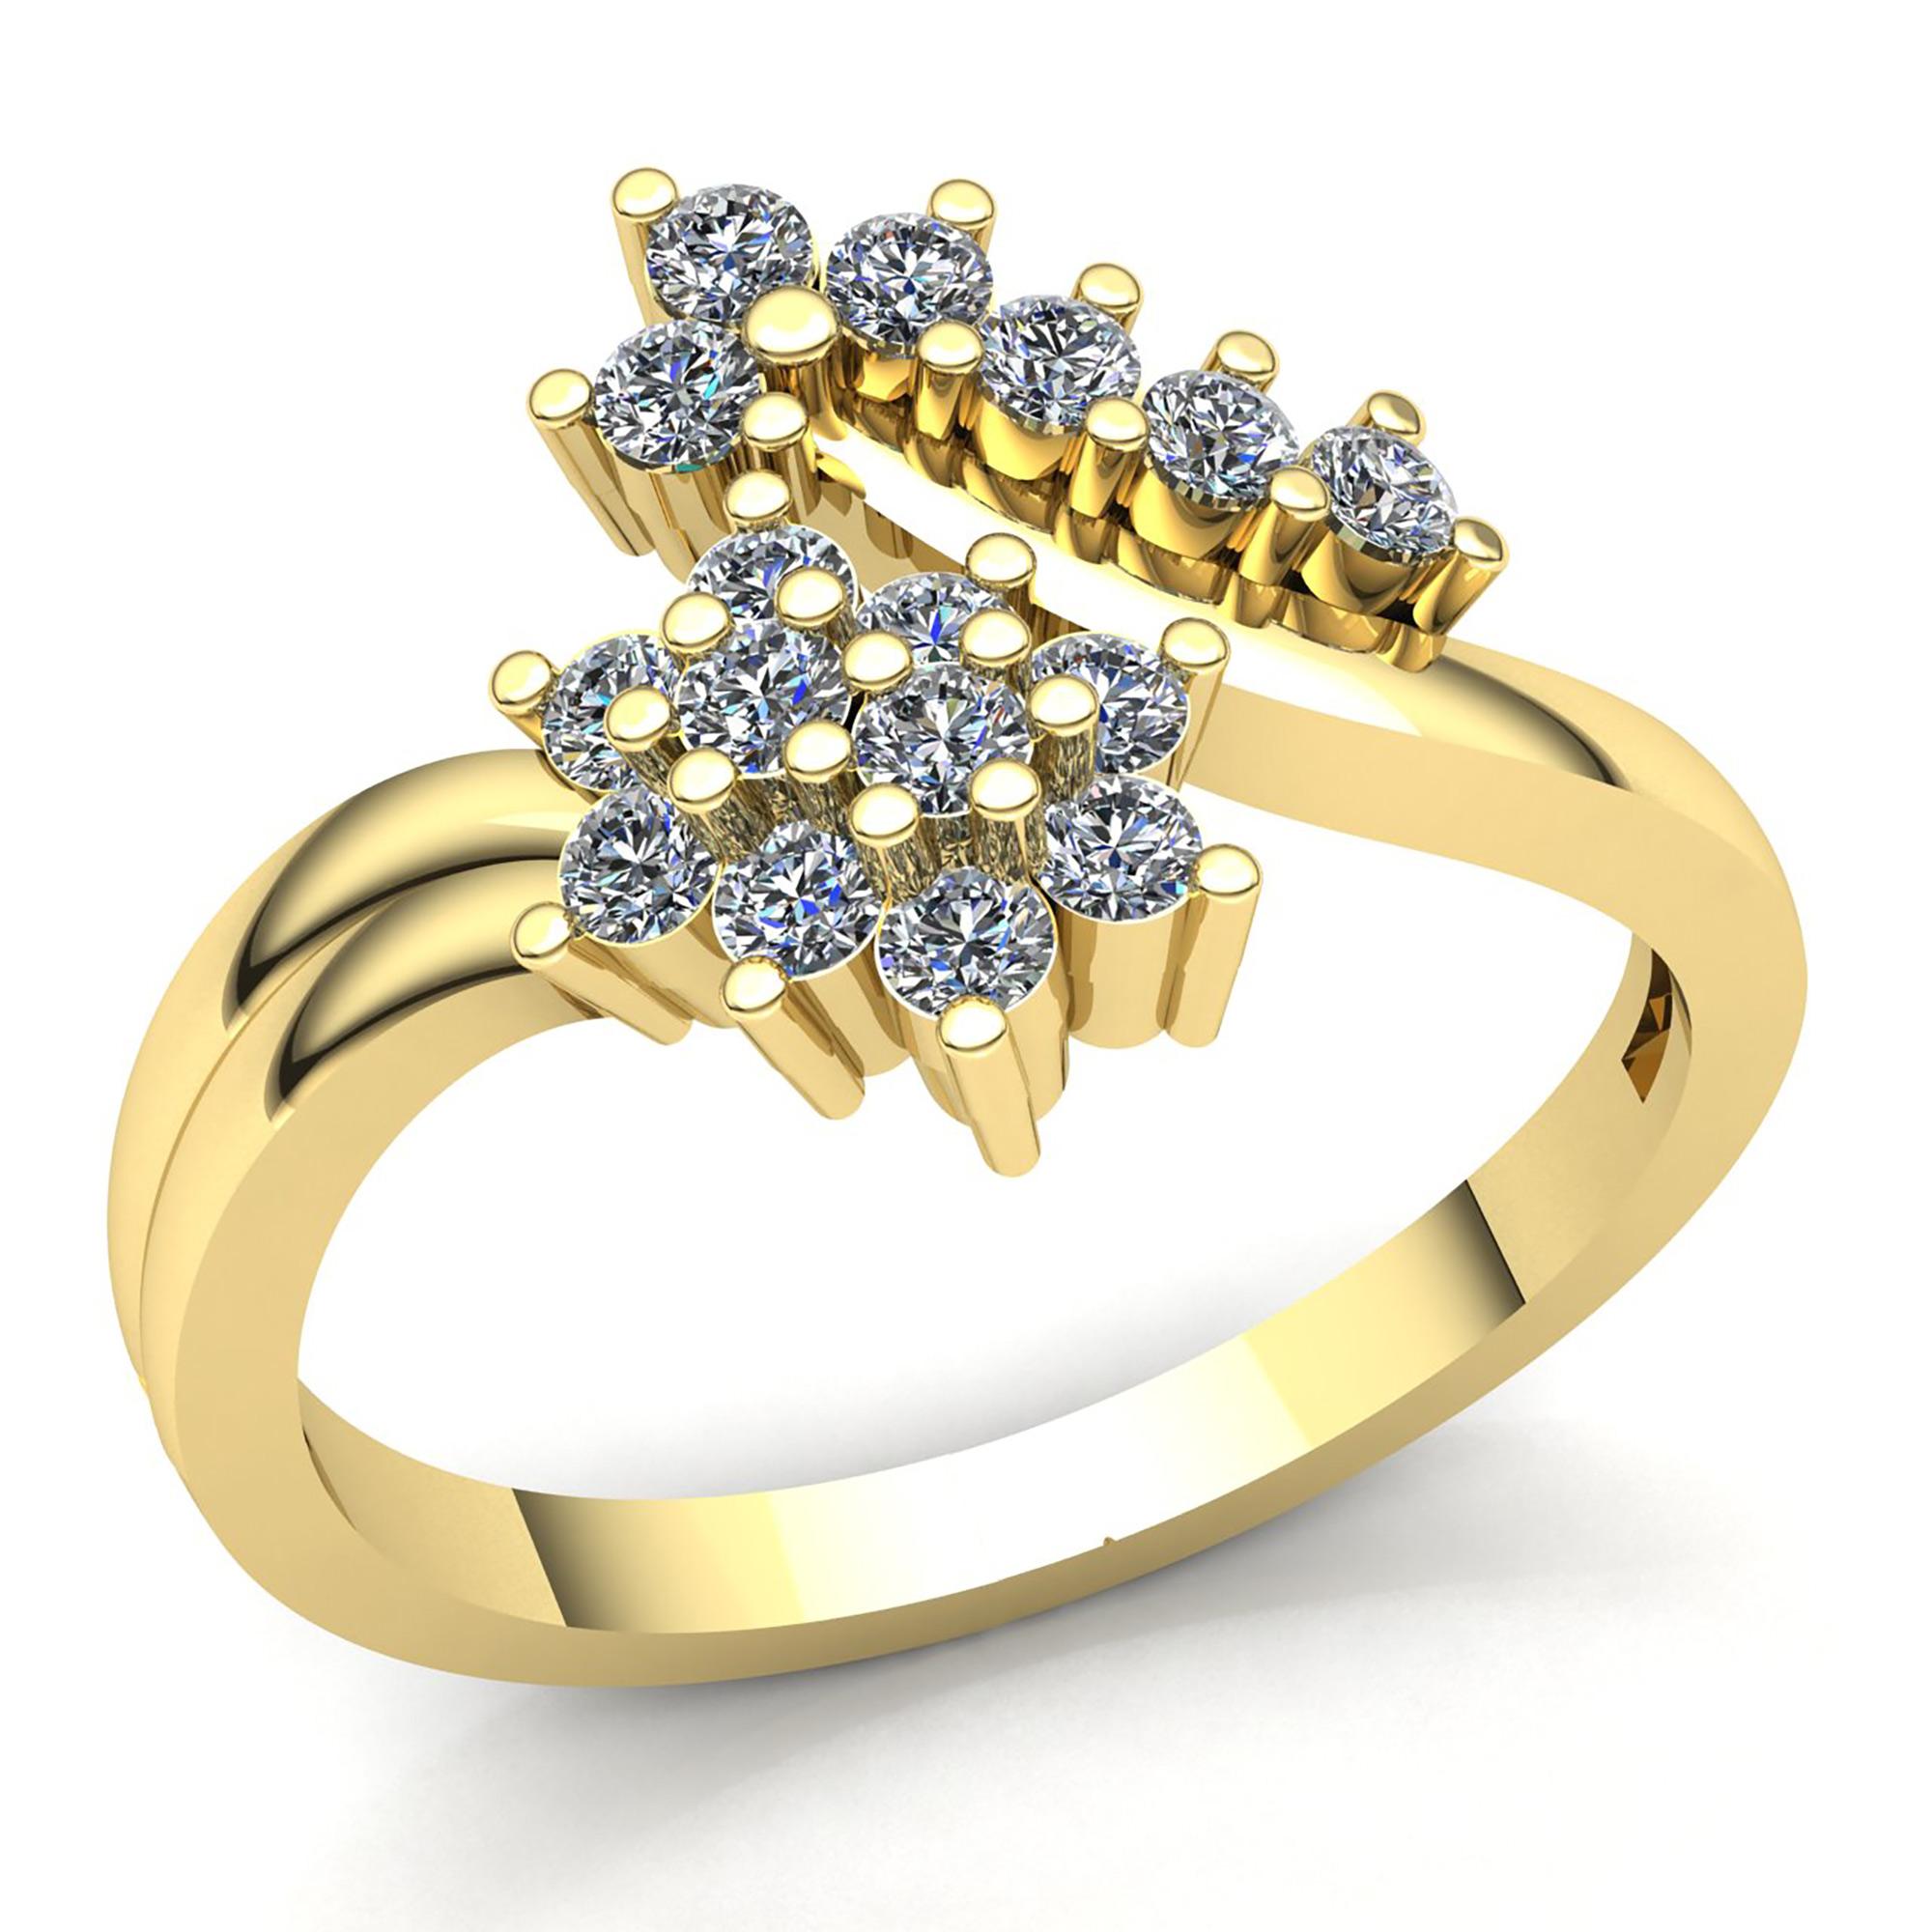 Genuine 1.5ct Round Cut Diamond Ladies Cluster Flower Fancy Ring 10K gold